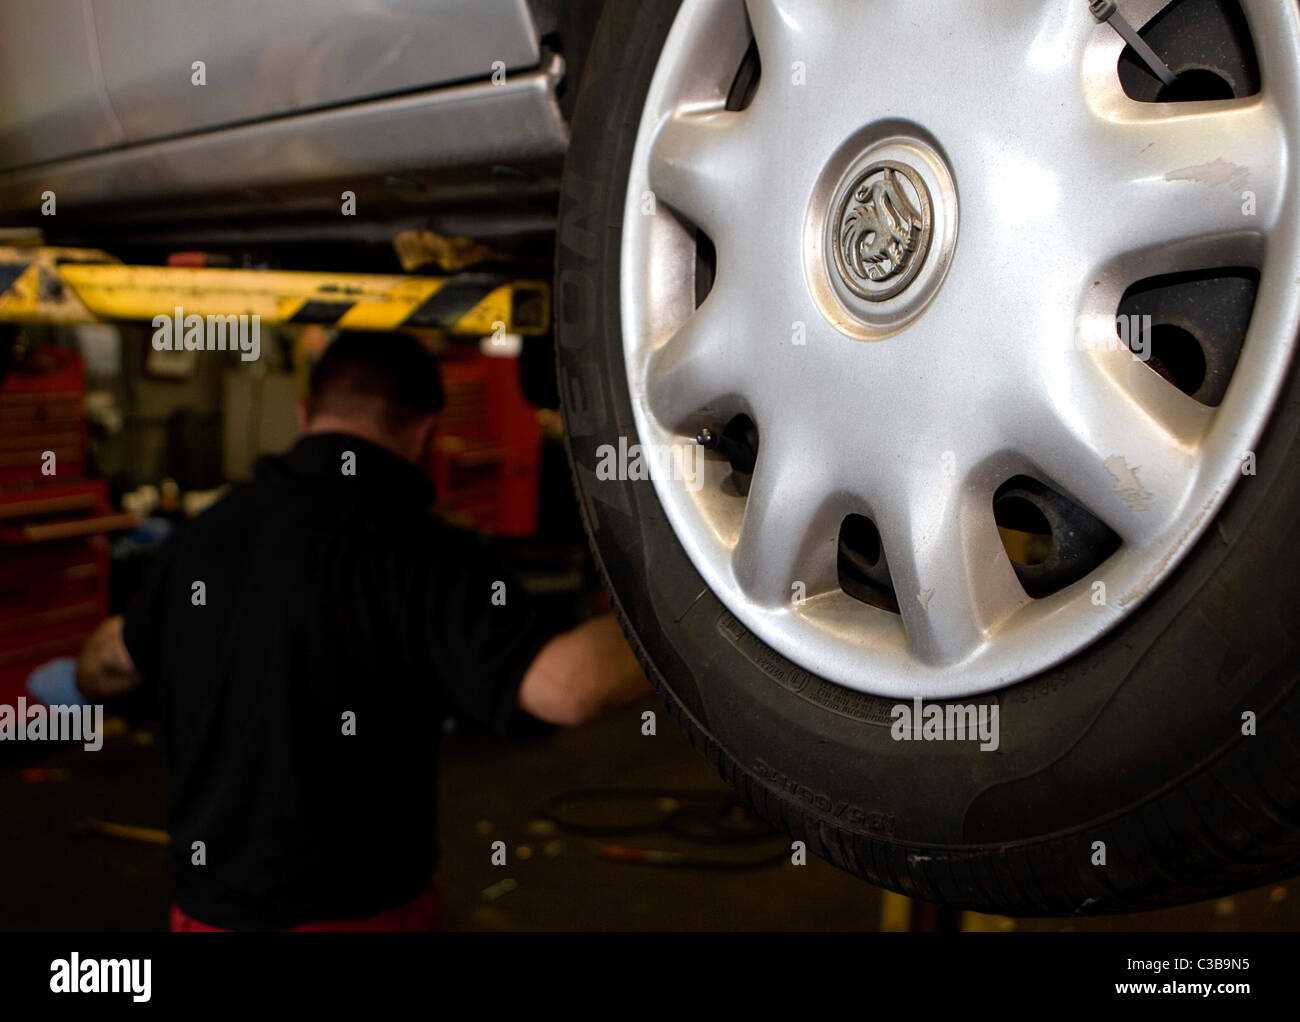 Imagen ilustrativa de Vauxhall coches, parte del grupo General Motors. Imagen De Stock